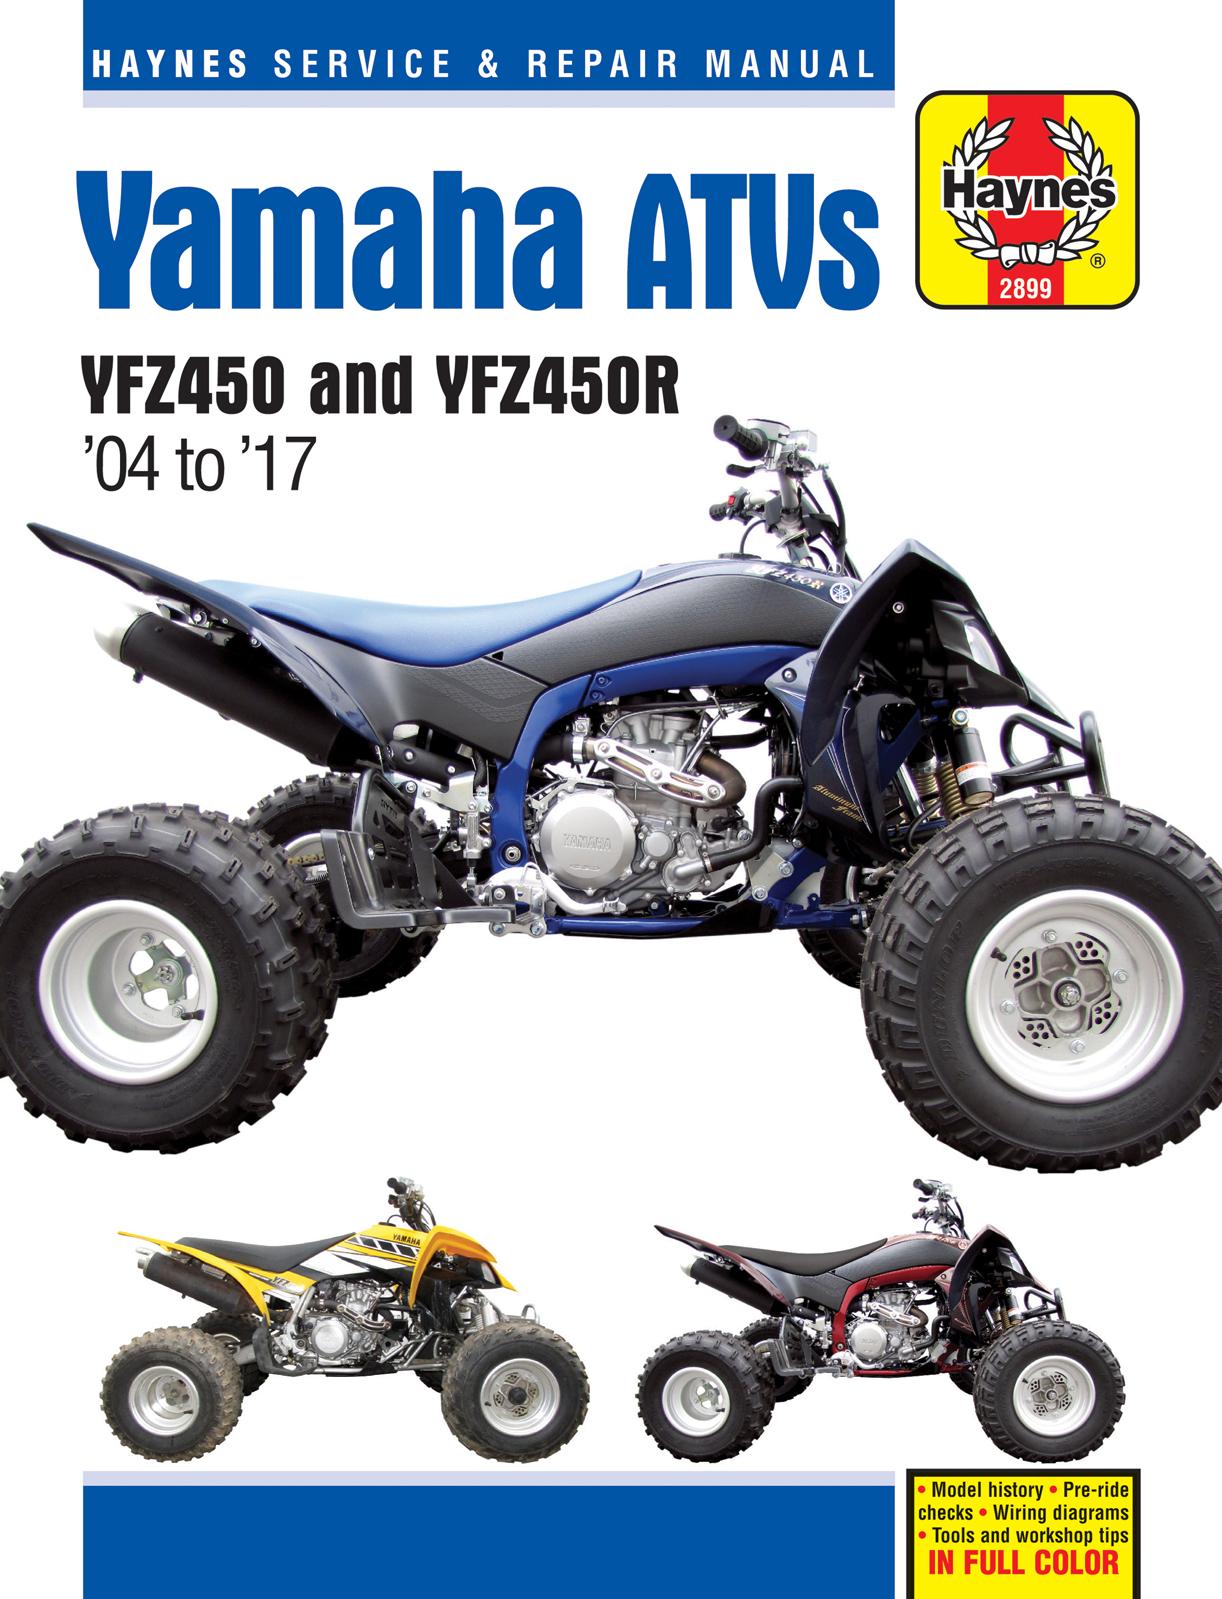 Clymer Repair Manuals for Yamaha YFZ 450 2004-2009